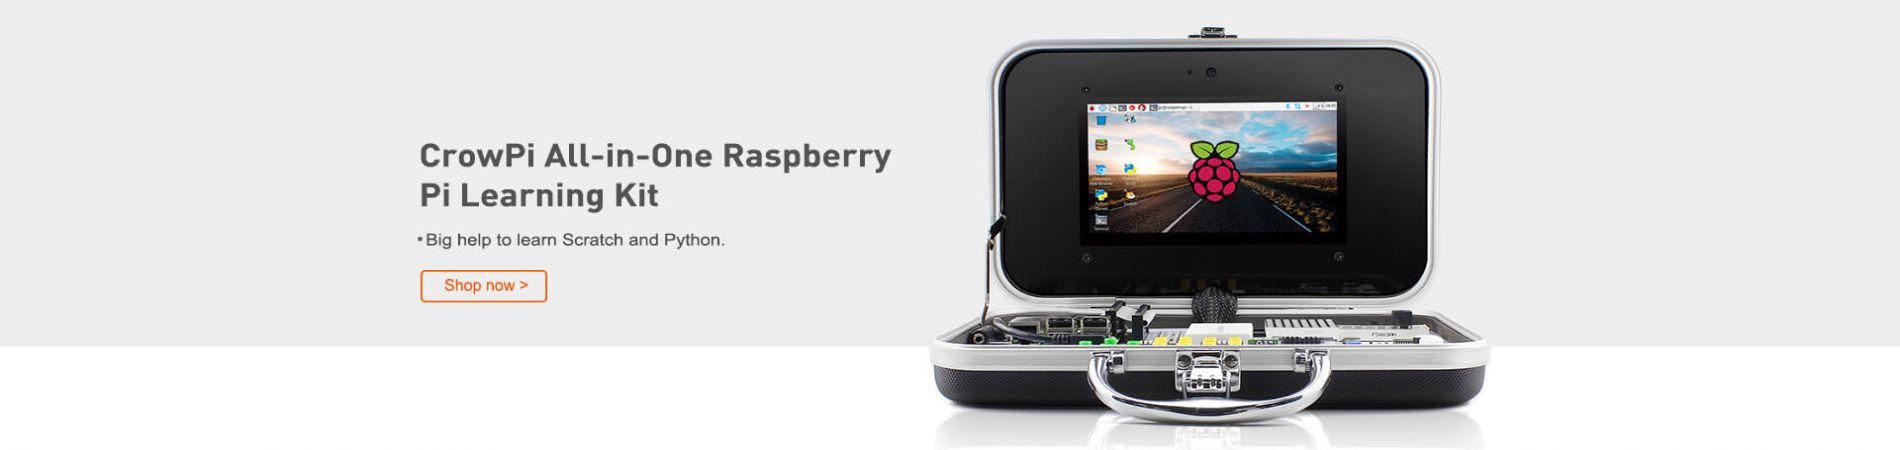 /crowpi-compact-raspberry-pi-educational-kit.html